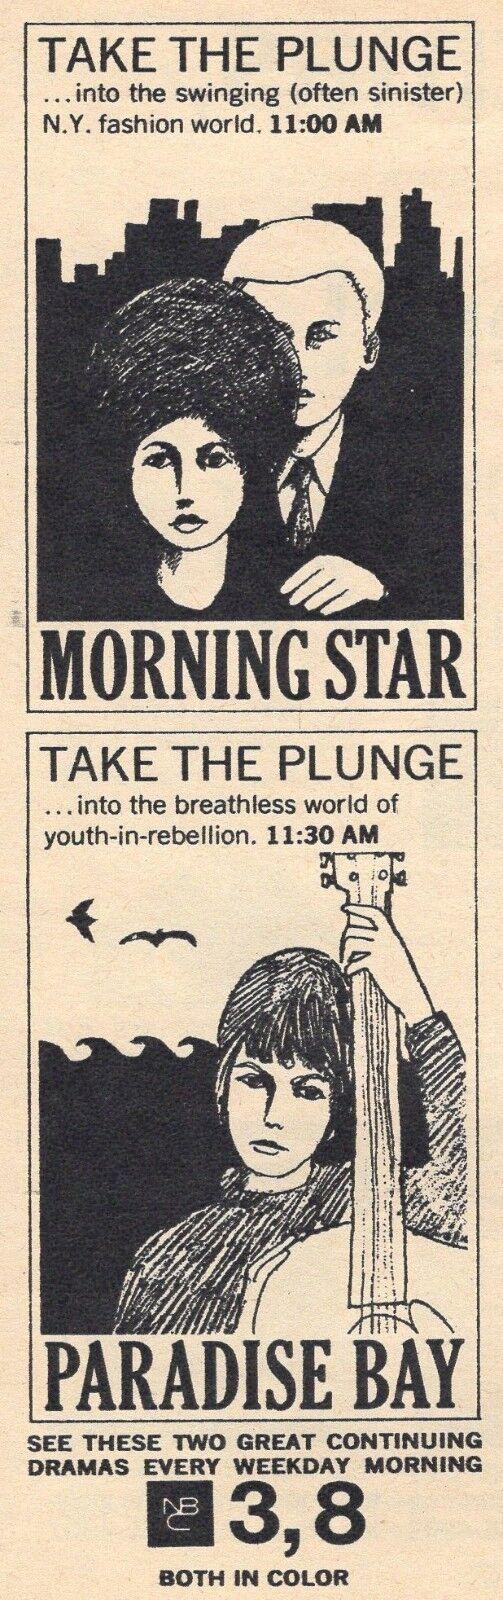 Image 1 - 1967 NBC TV AD~MORNING STAR~PARADISE BAY~NEW YORK FASHION~YOUTH IN REBELLION